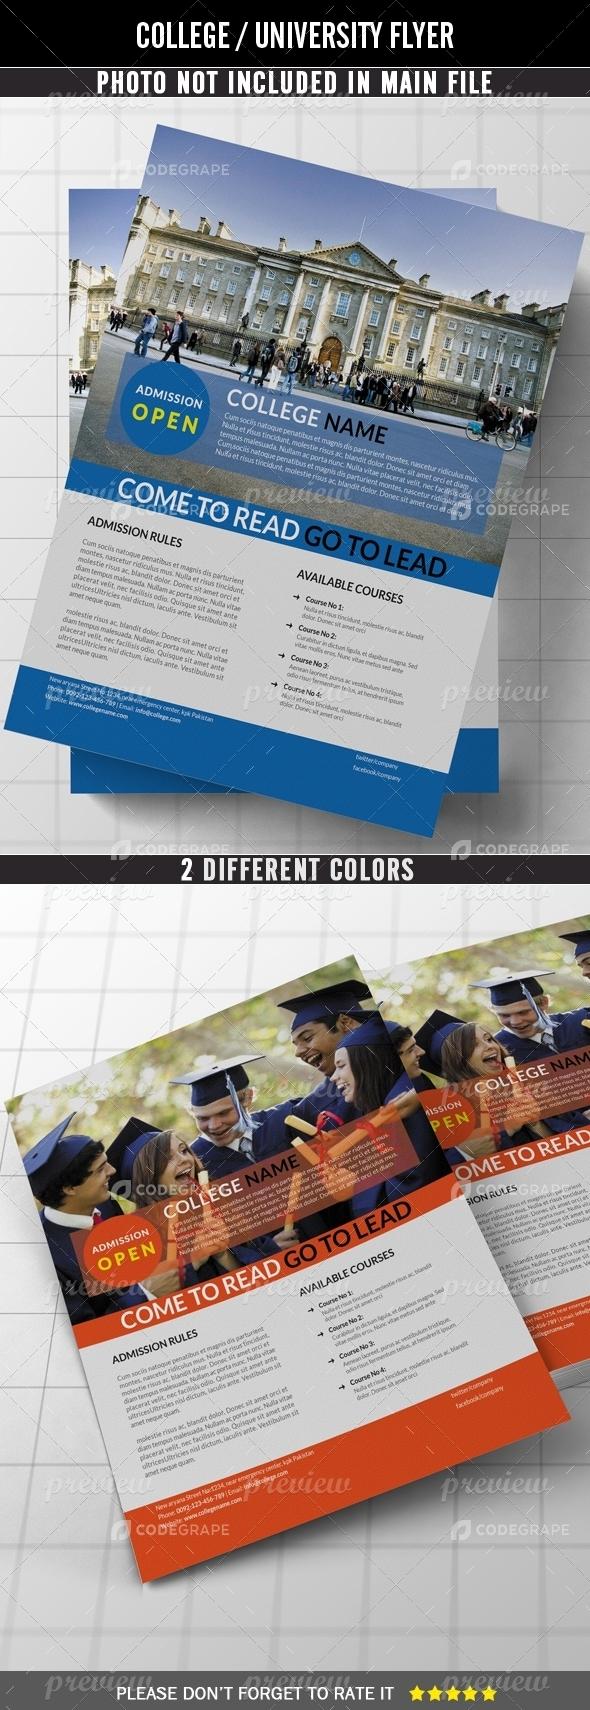 College / University Flyer